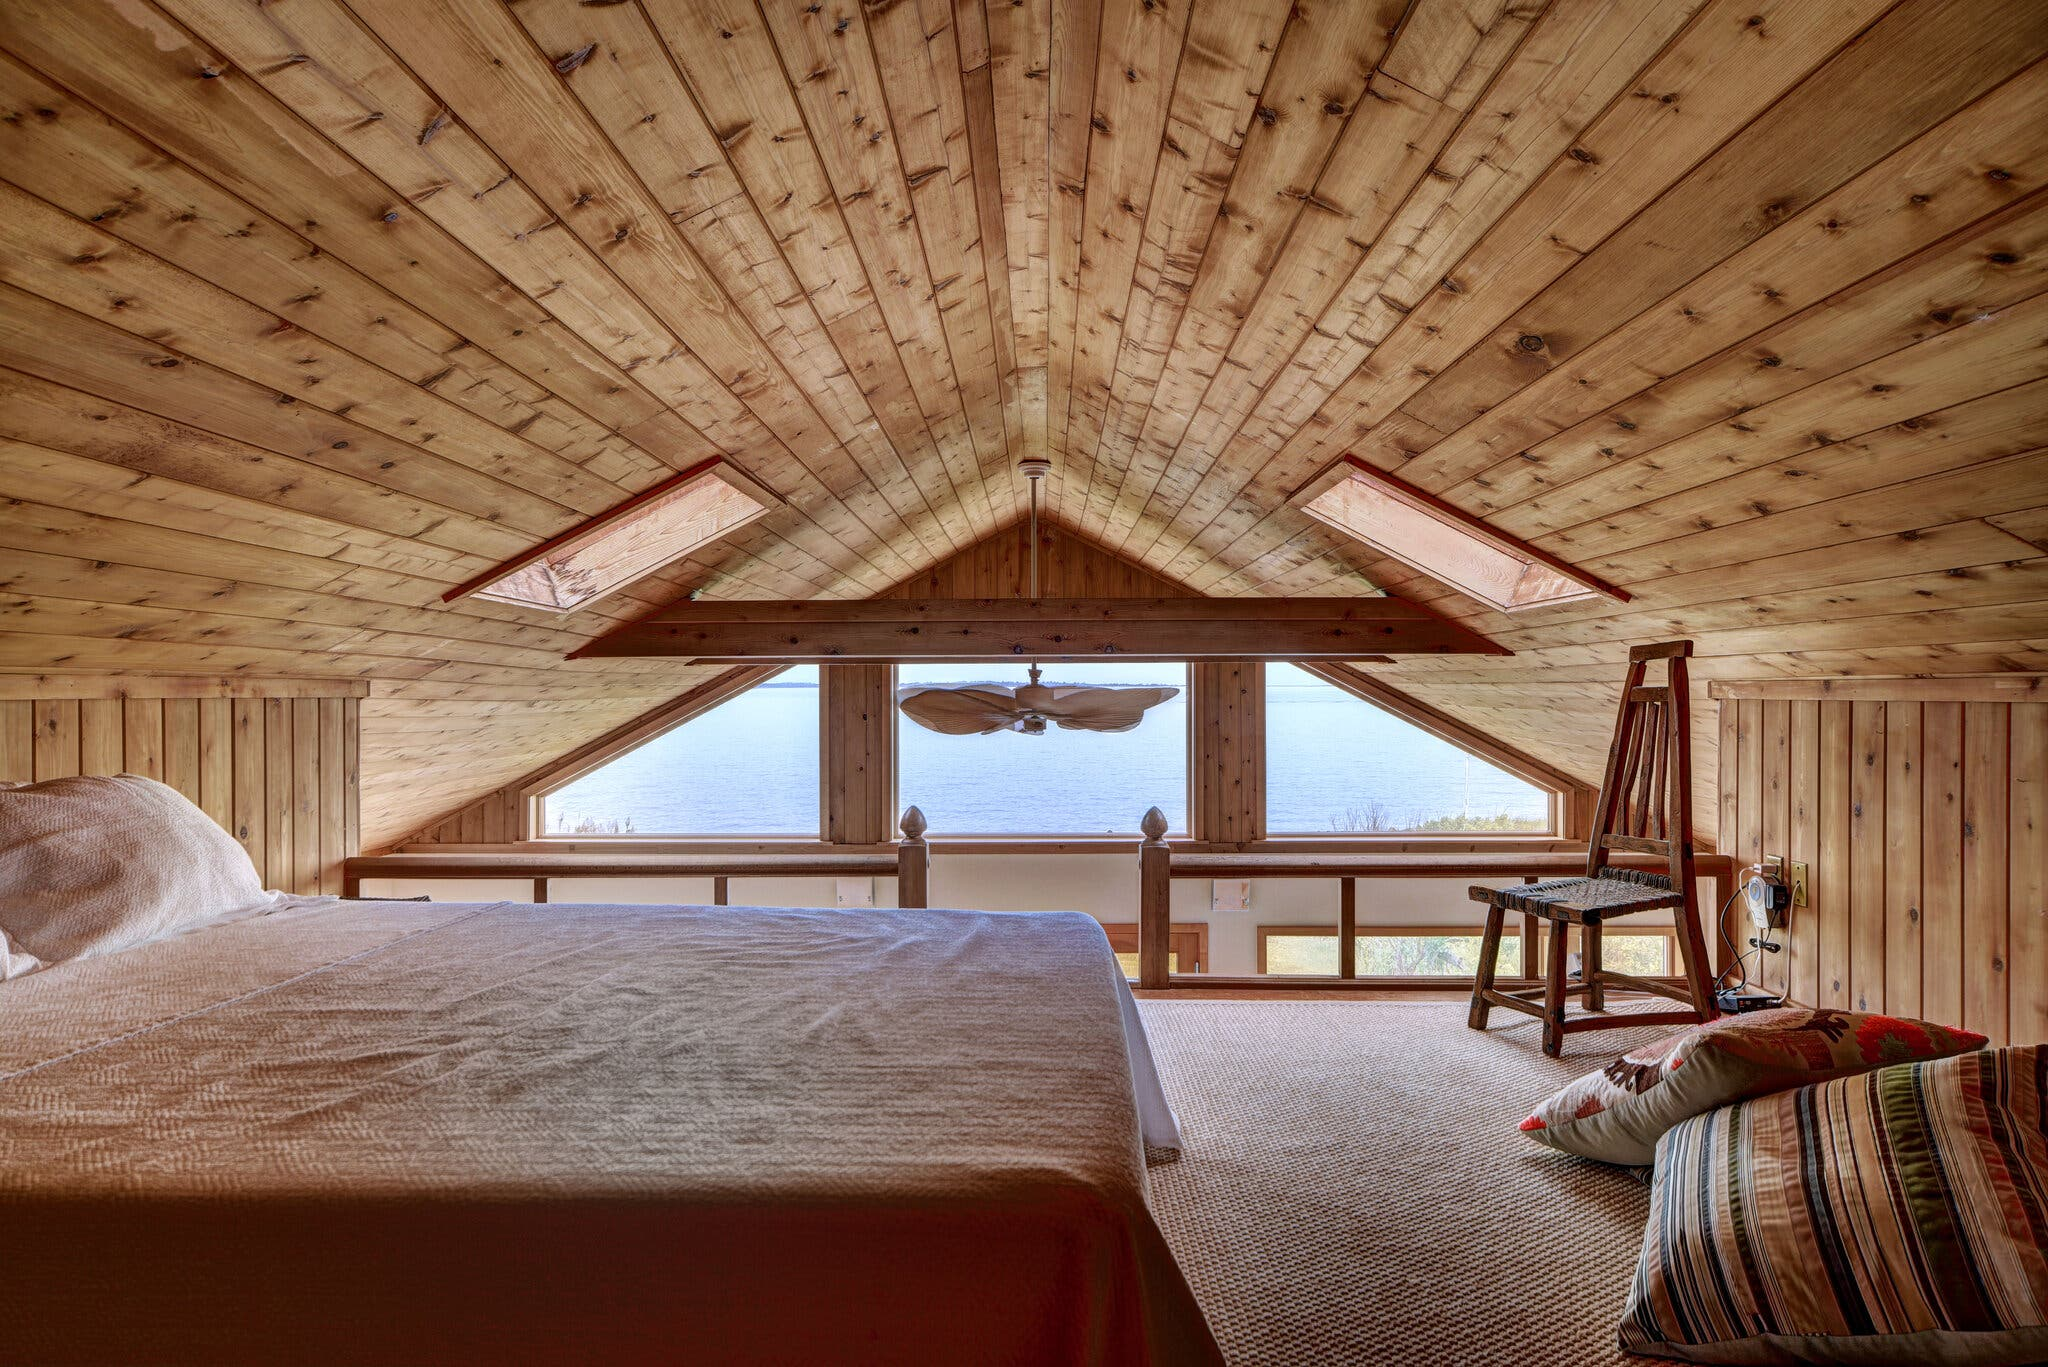 Dormitorio con vestidor / Chris Foster for Sotheby's International Realty